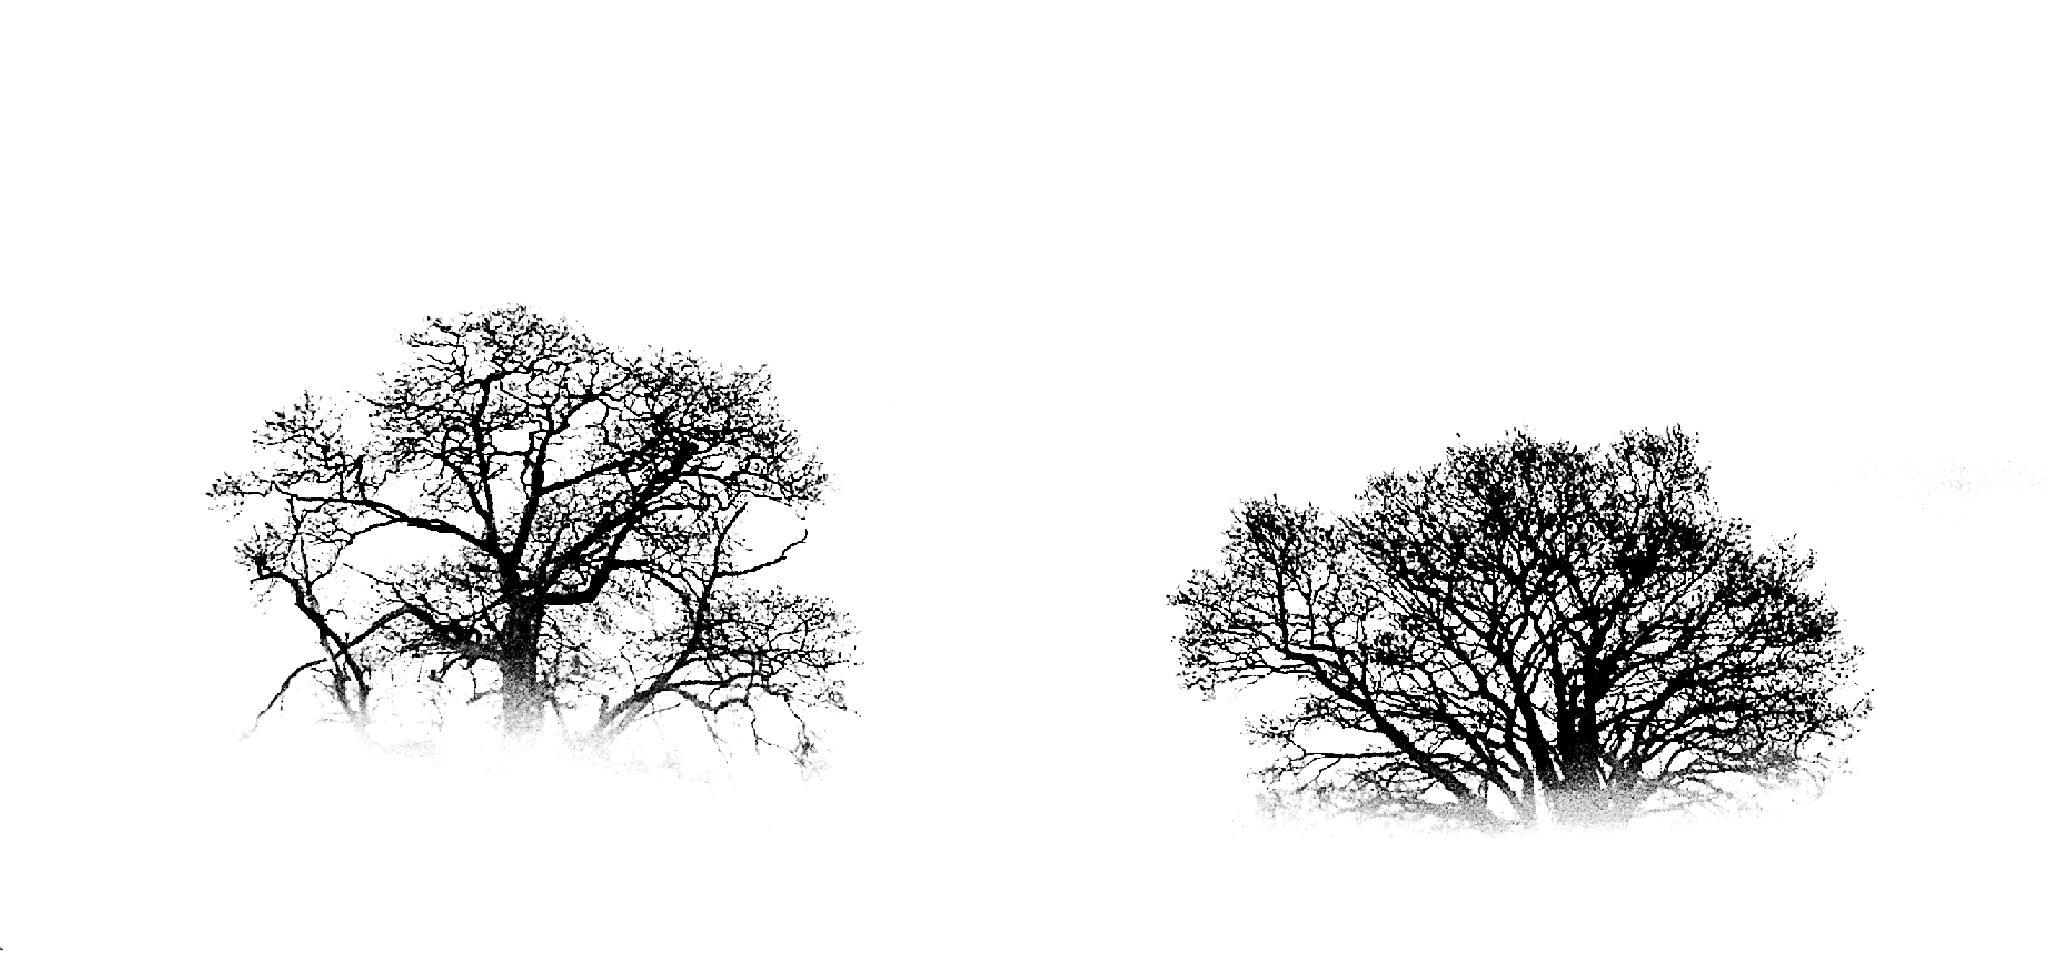 Trees by GeraldGraves